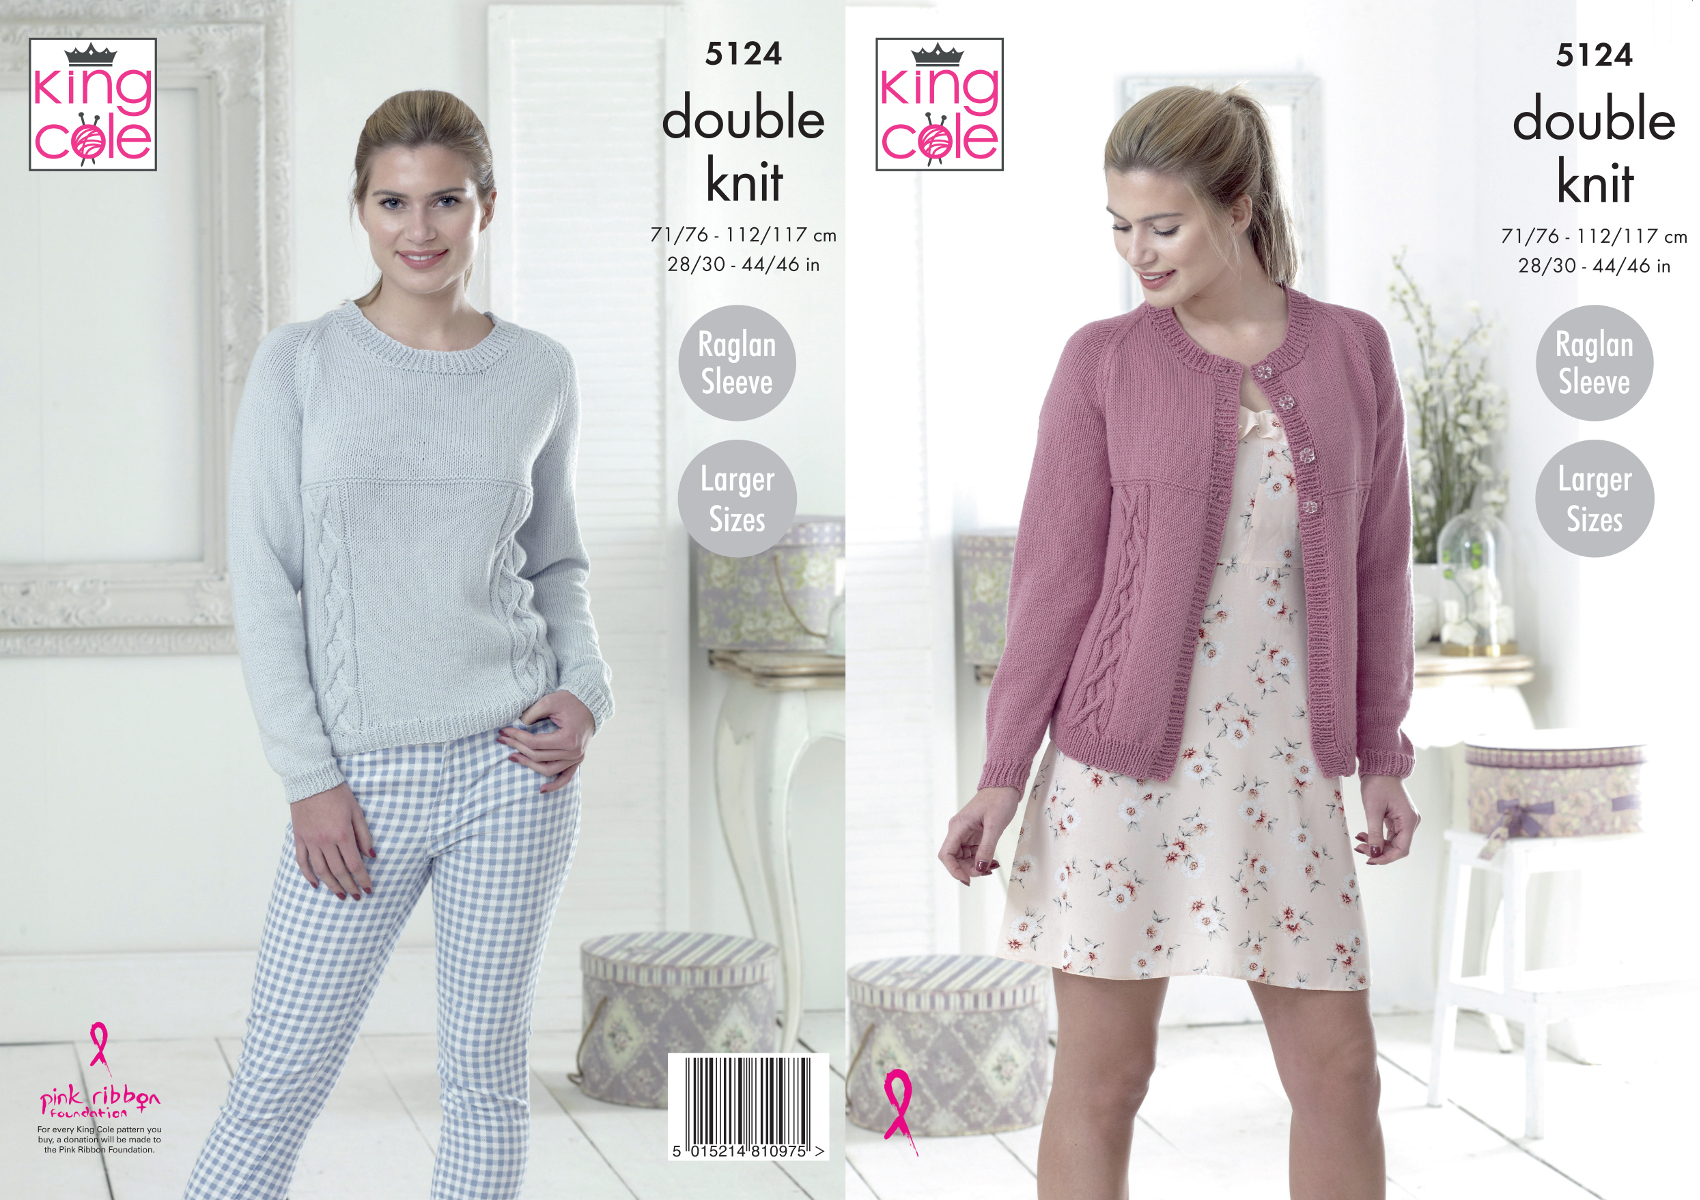 47e16f5102eda King Cole Ladies Double Knitting Pattern Raglan Sleeve Cardigan ...